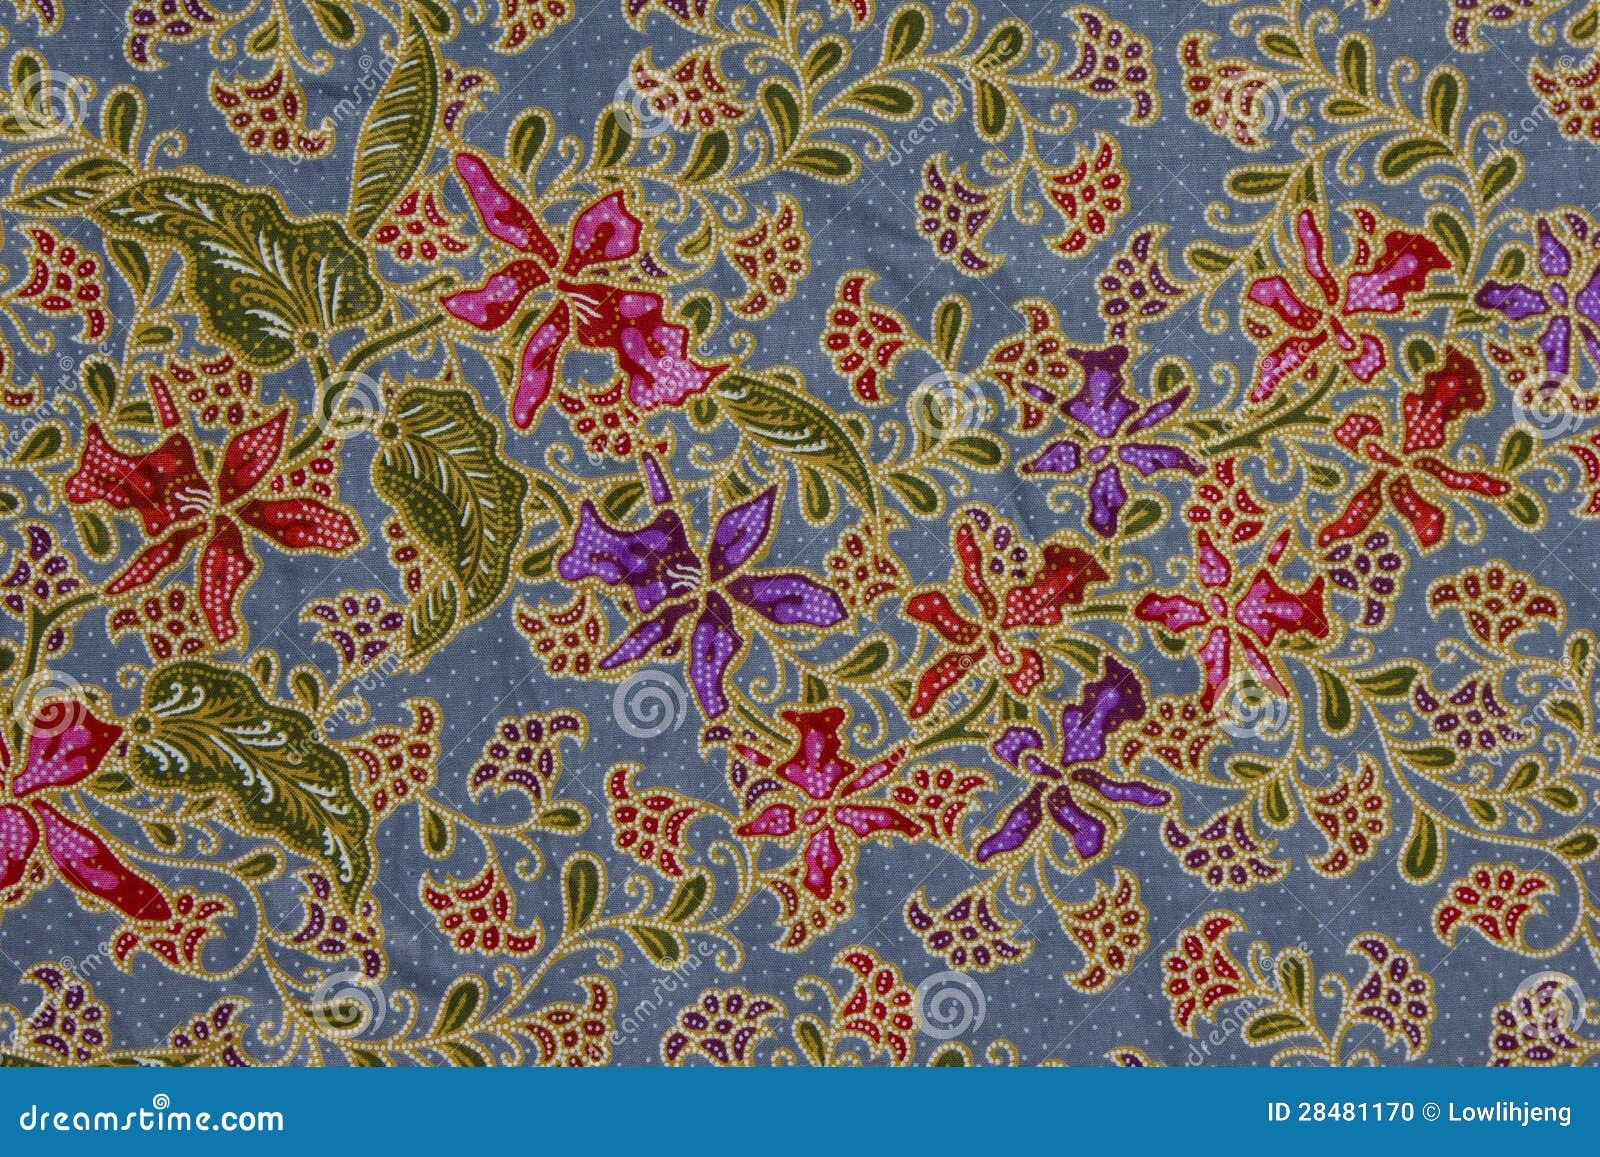 Batik pattern, Indonesia stock photo. Image of asian ...